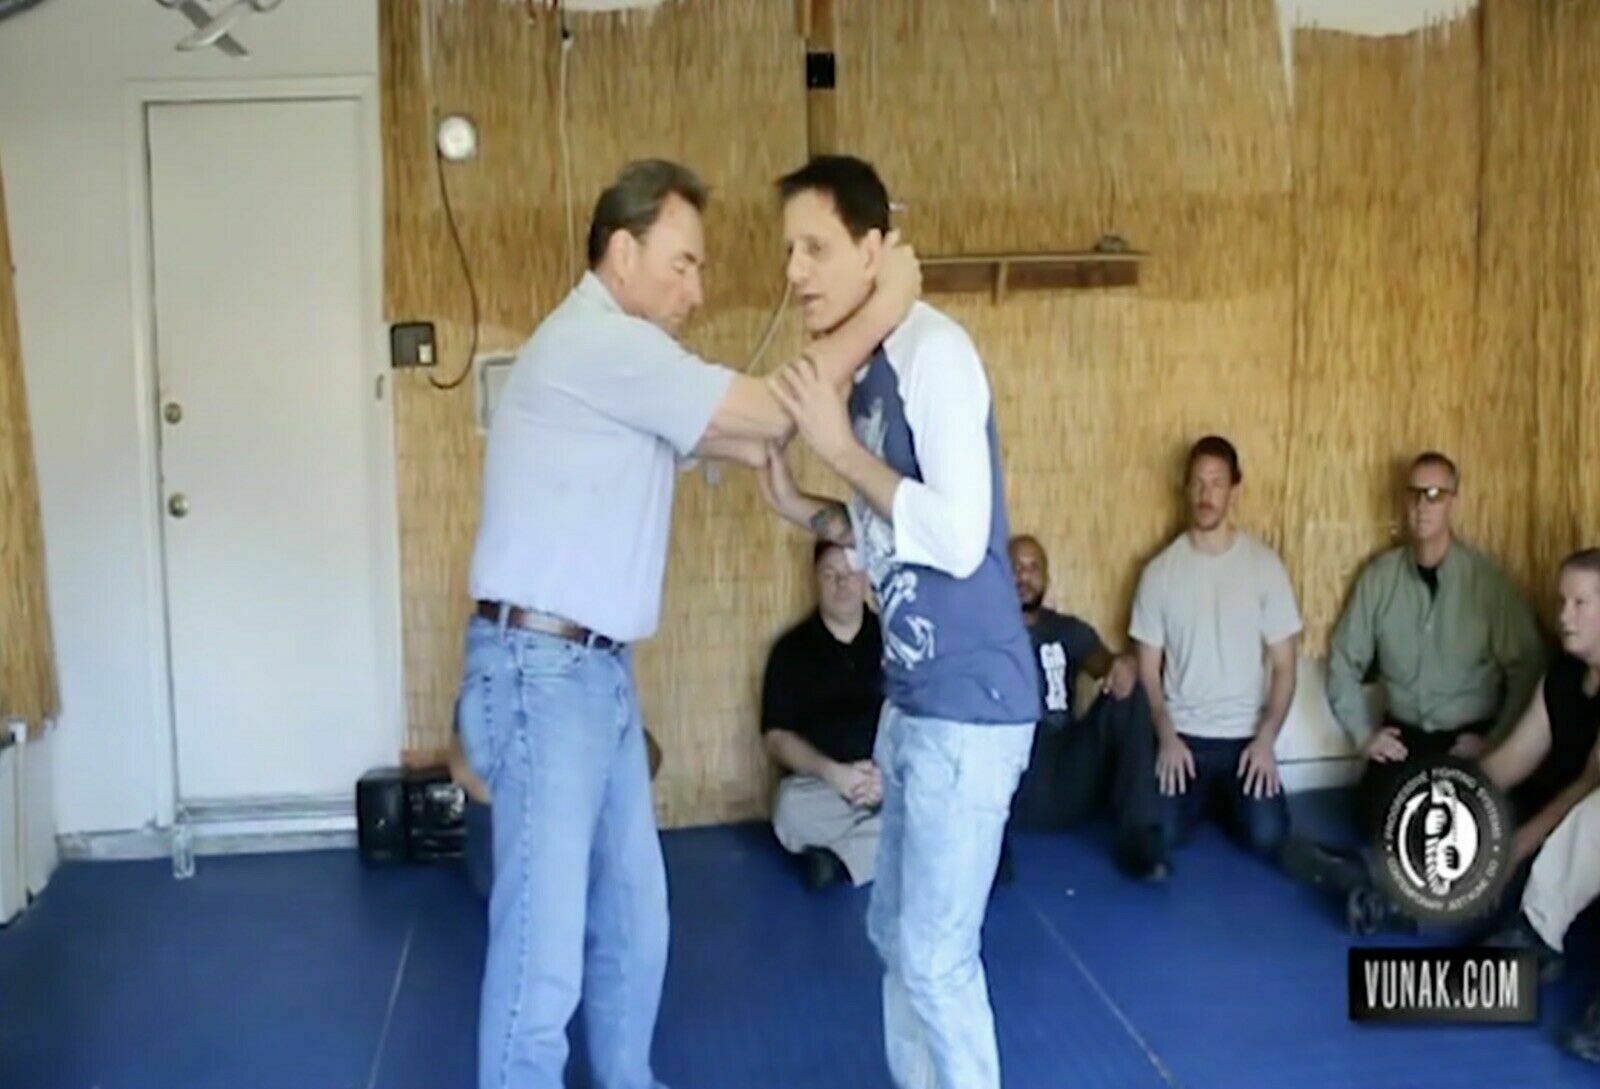 как выглядит PAUL VUNAK VIDEOS SERIES MANY OF THEM ARE RARE LOOK THE LIST , JKD, MMA, KALI фото